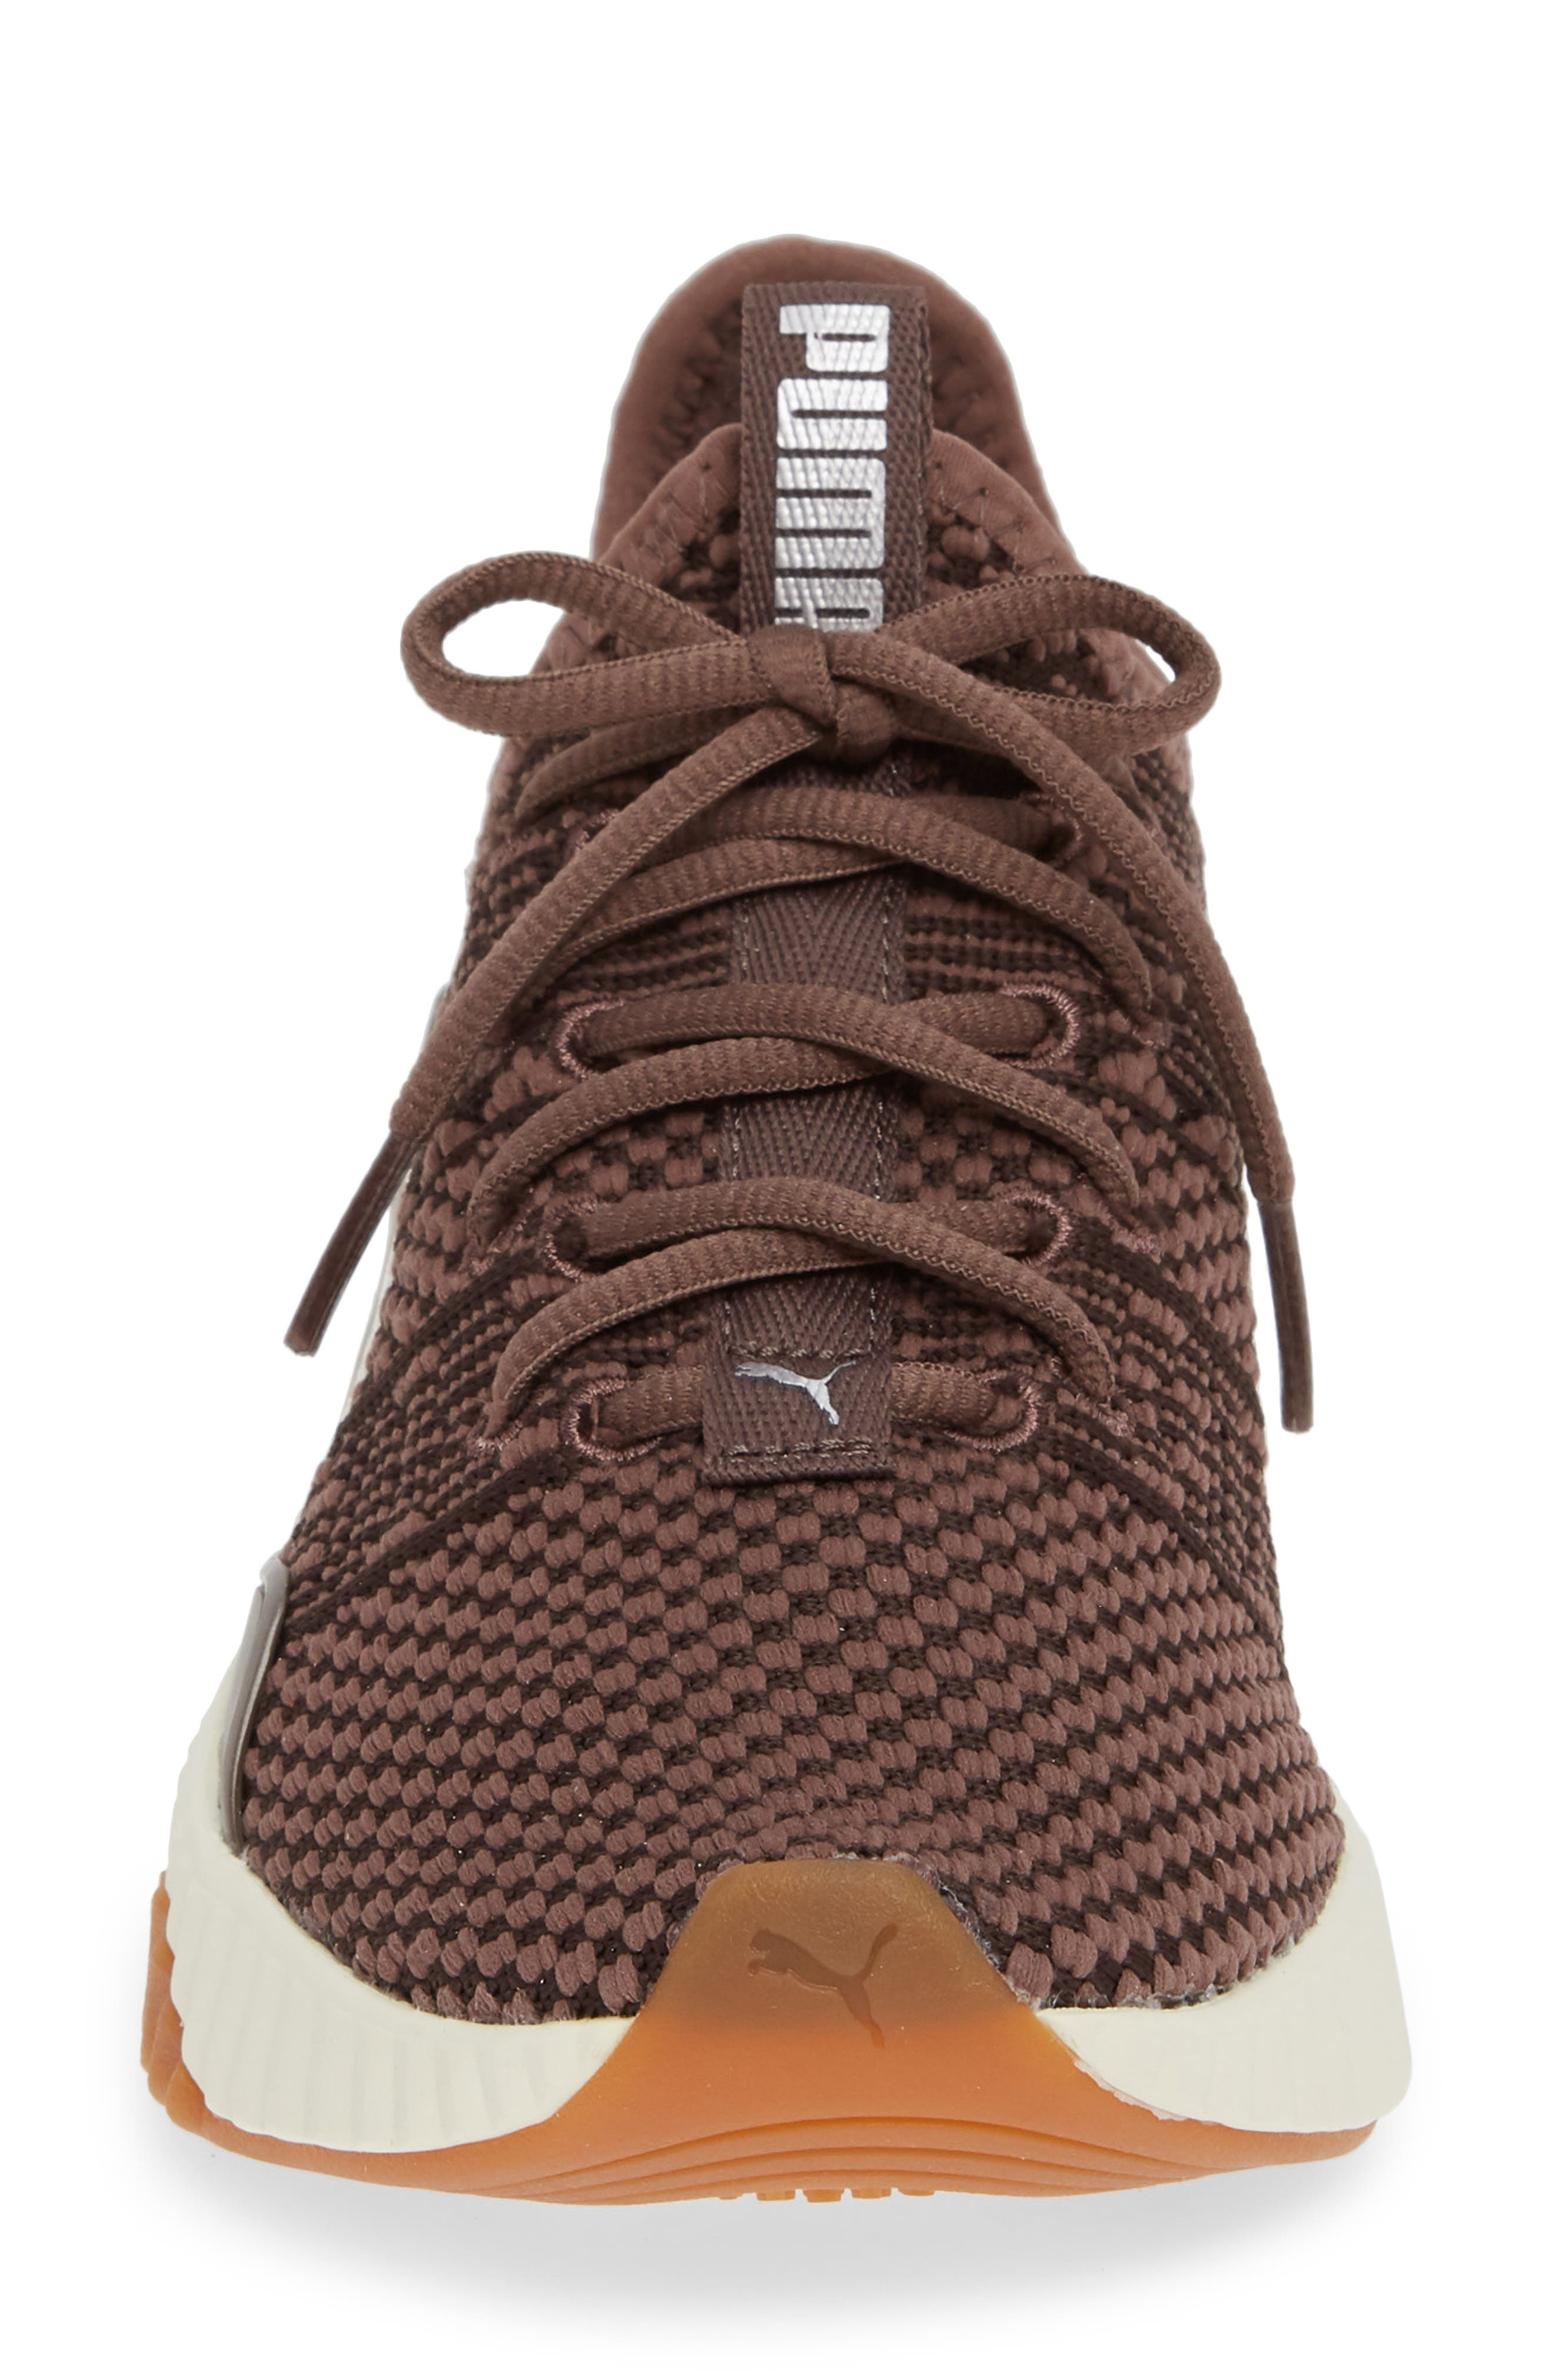 PUMA,                             Defy Luxe Sneaker,                             Alternate thumbnail 4, color,                             PEPPERCORN/ METALLIC ASH